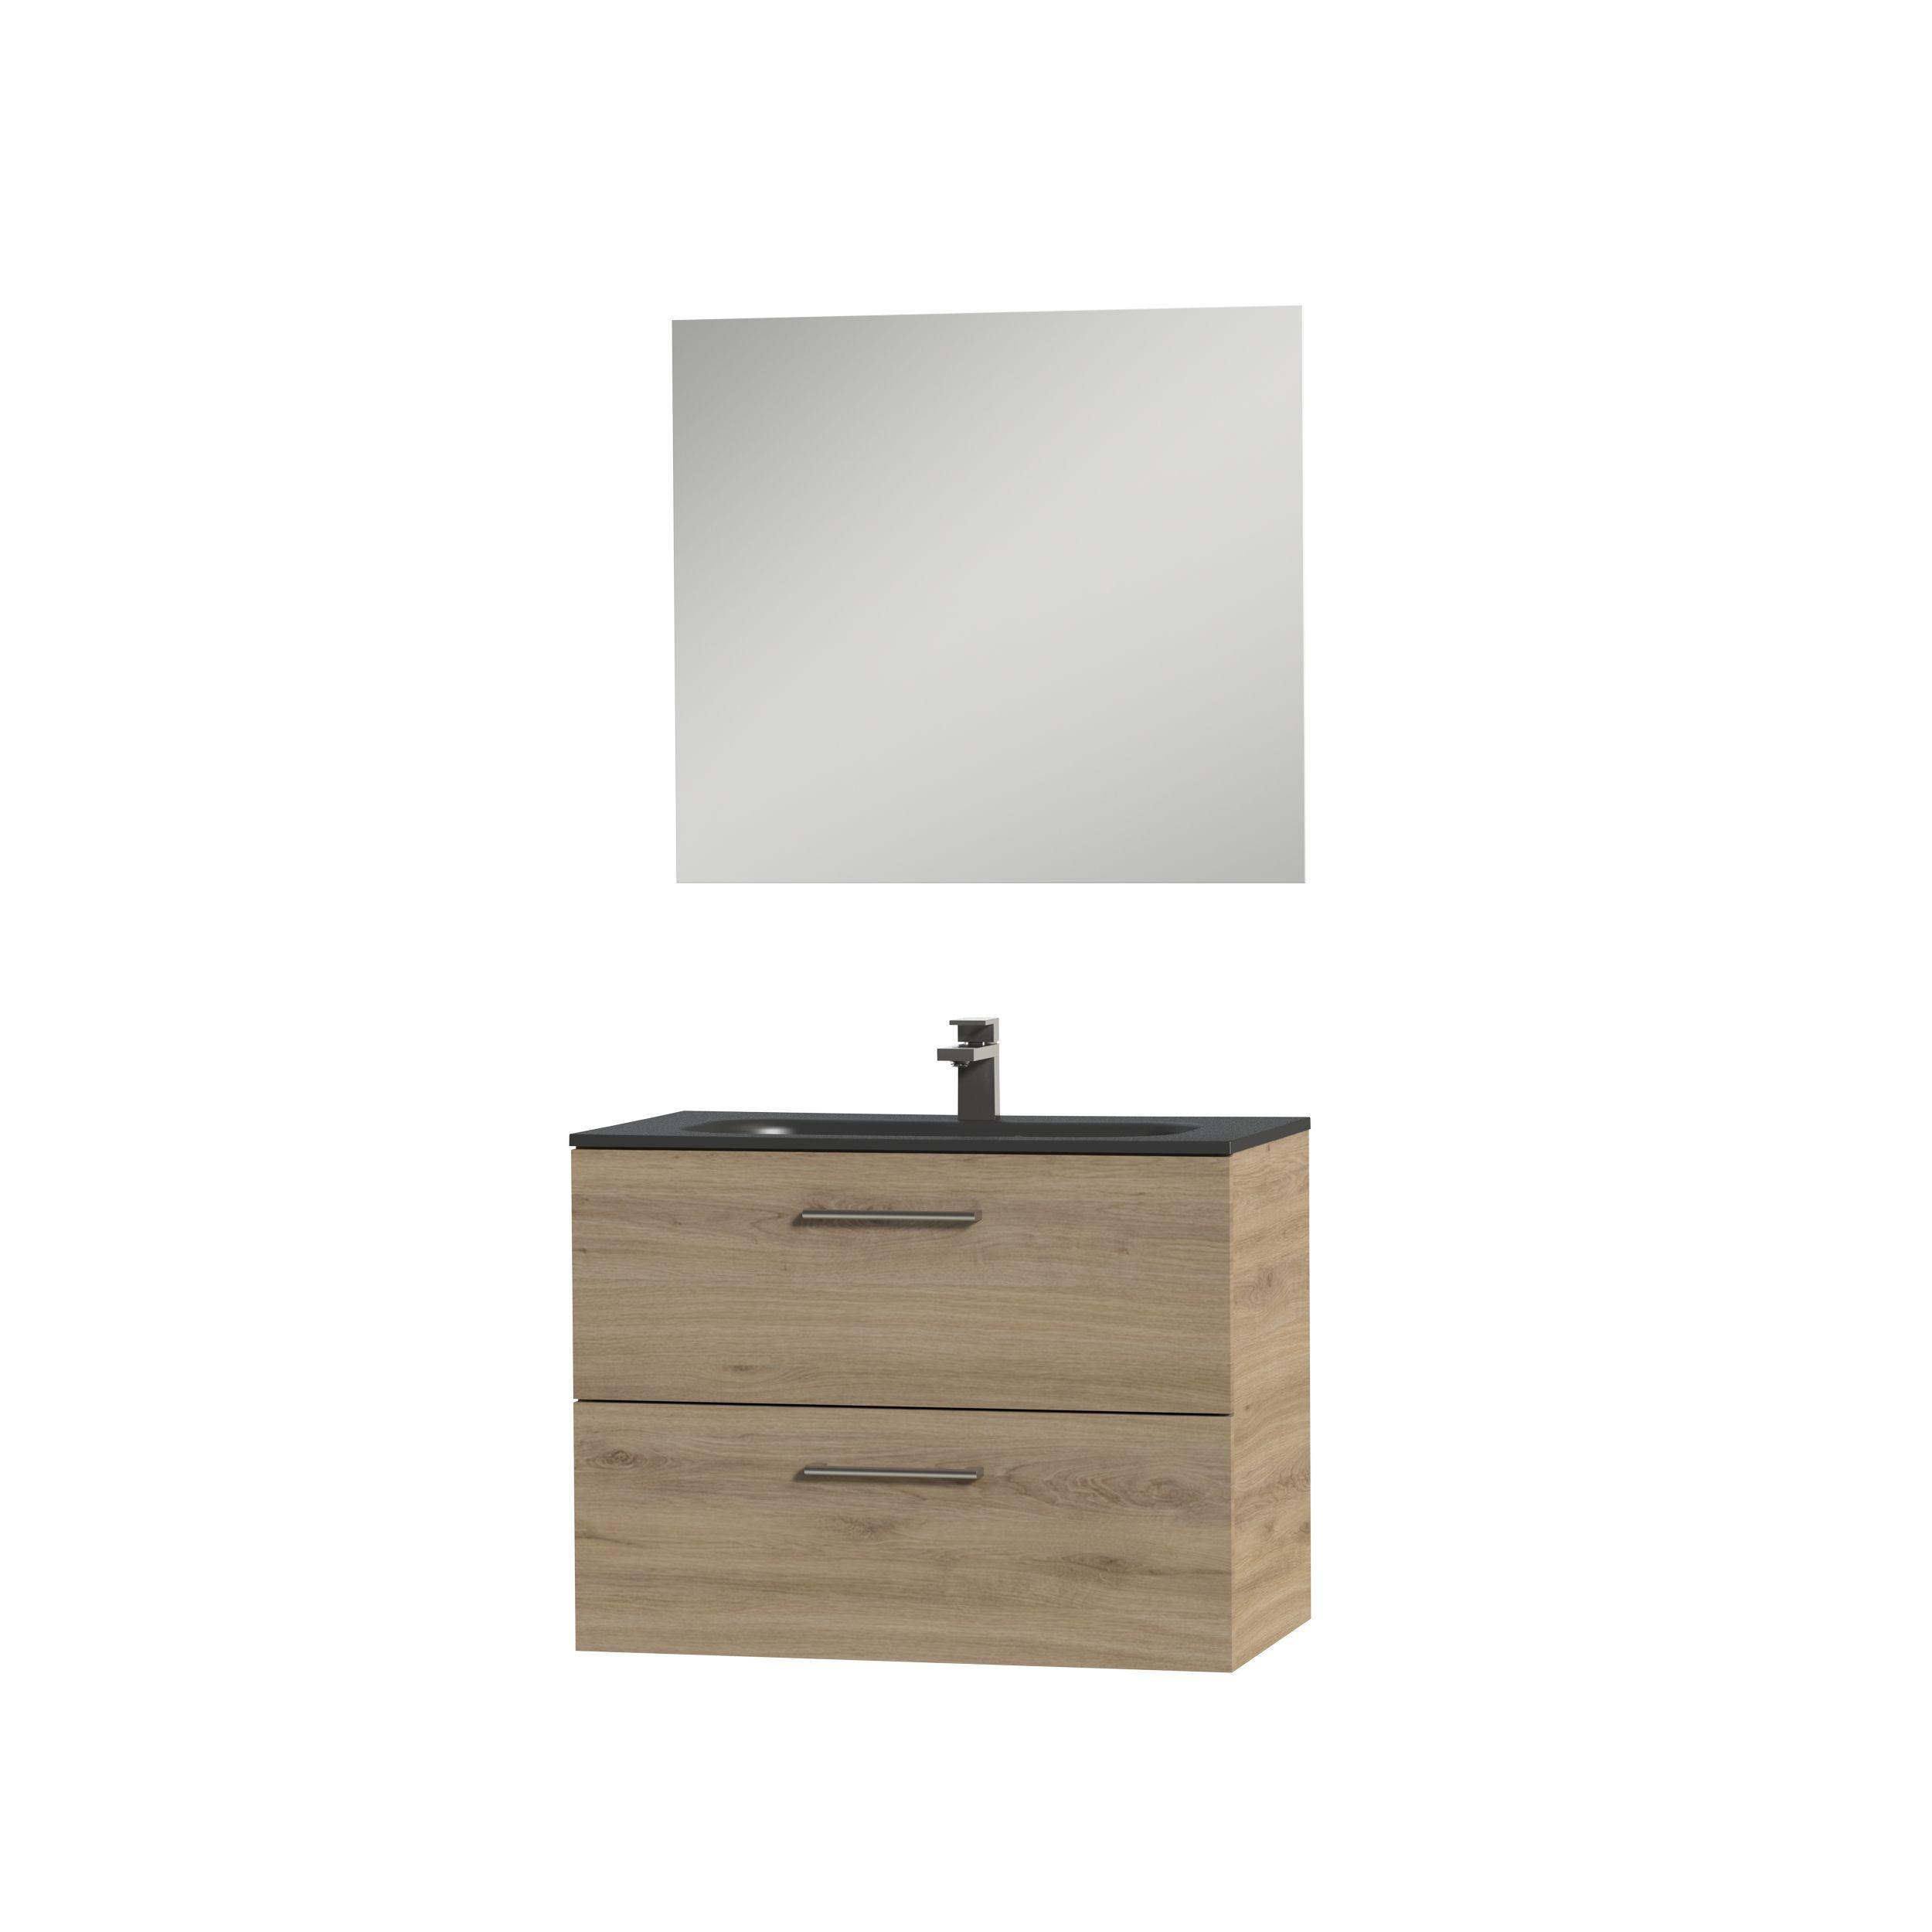 Tiger Studio badkamermeubel incl spiegel en zwarte wastafel 80cm chalet eiken